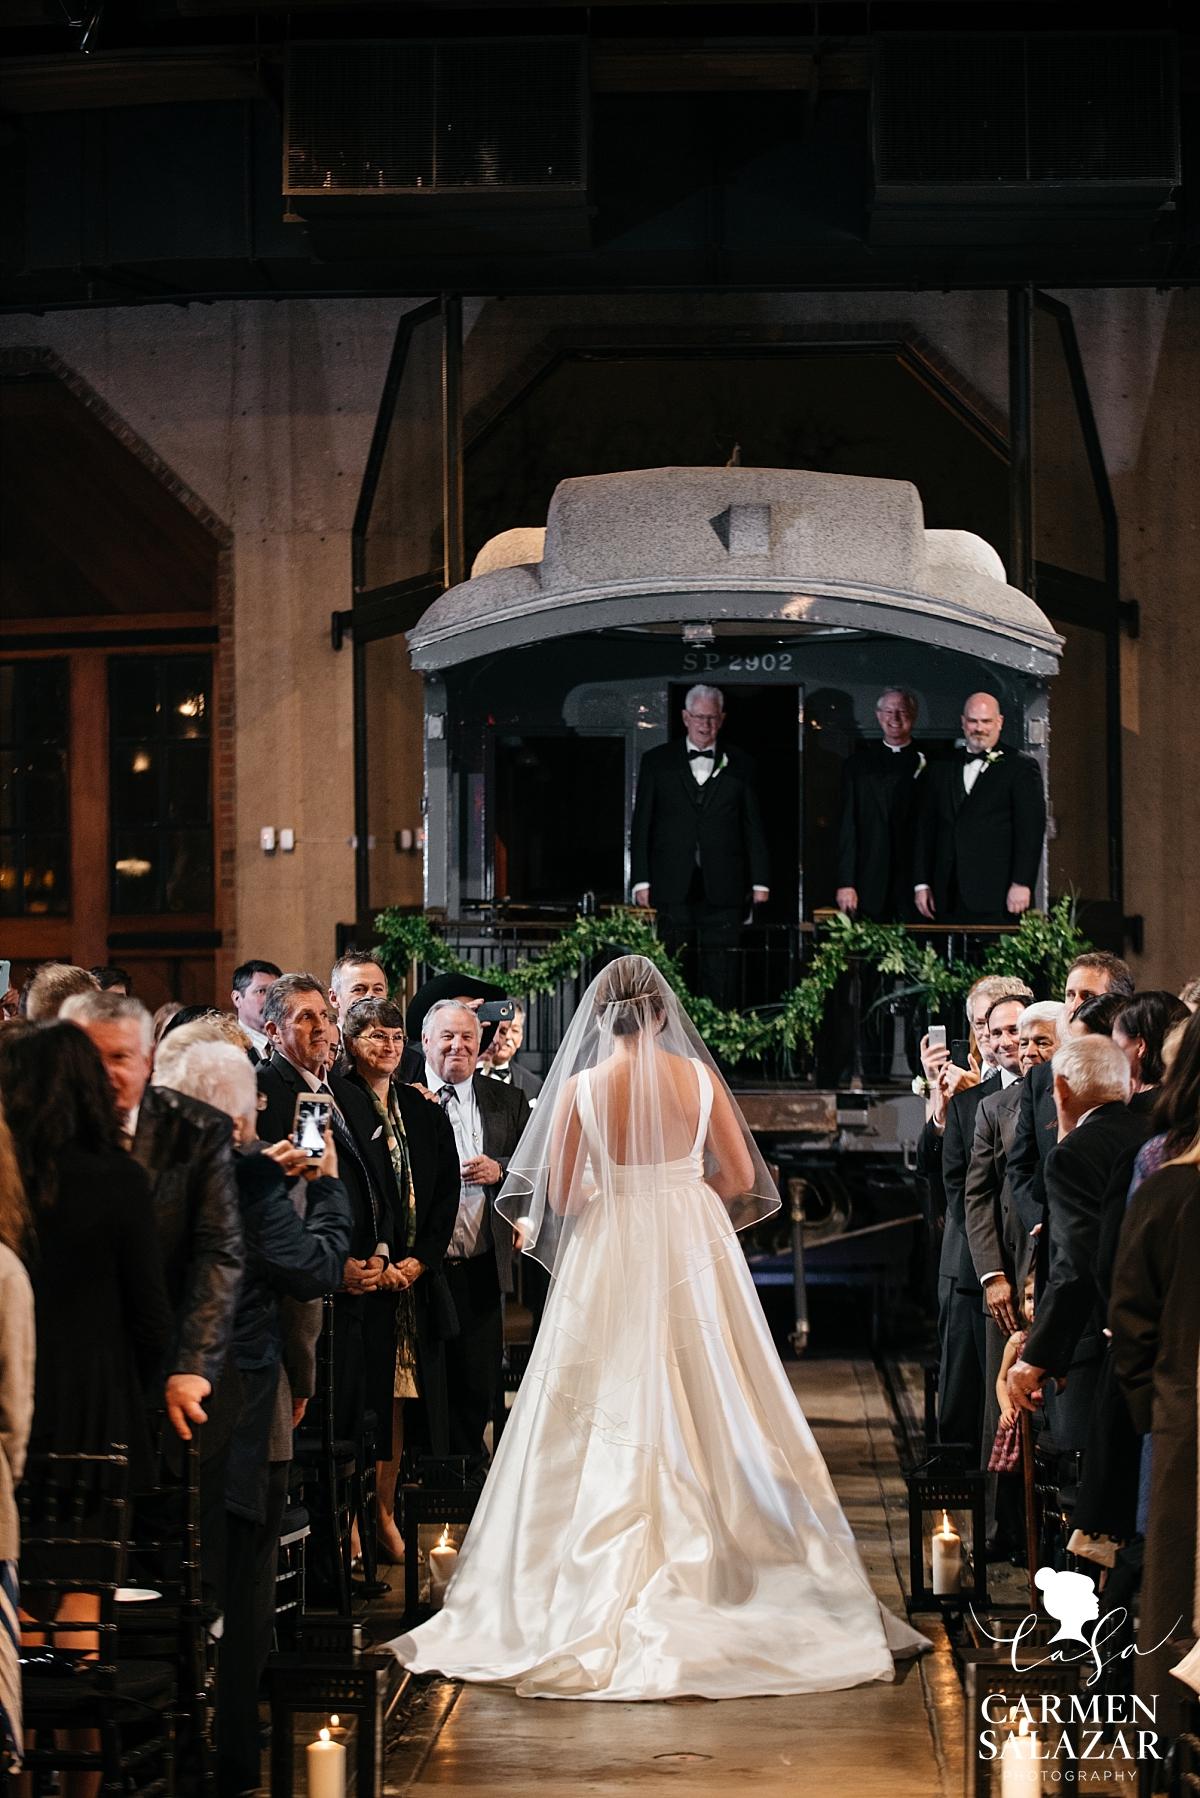 Bride walking down the aisle at Railroad Museum - Carmen Salazar